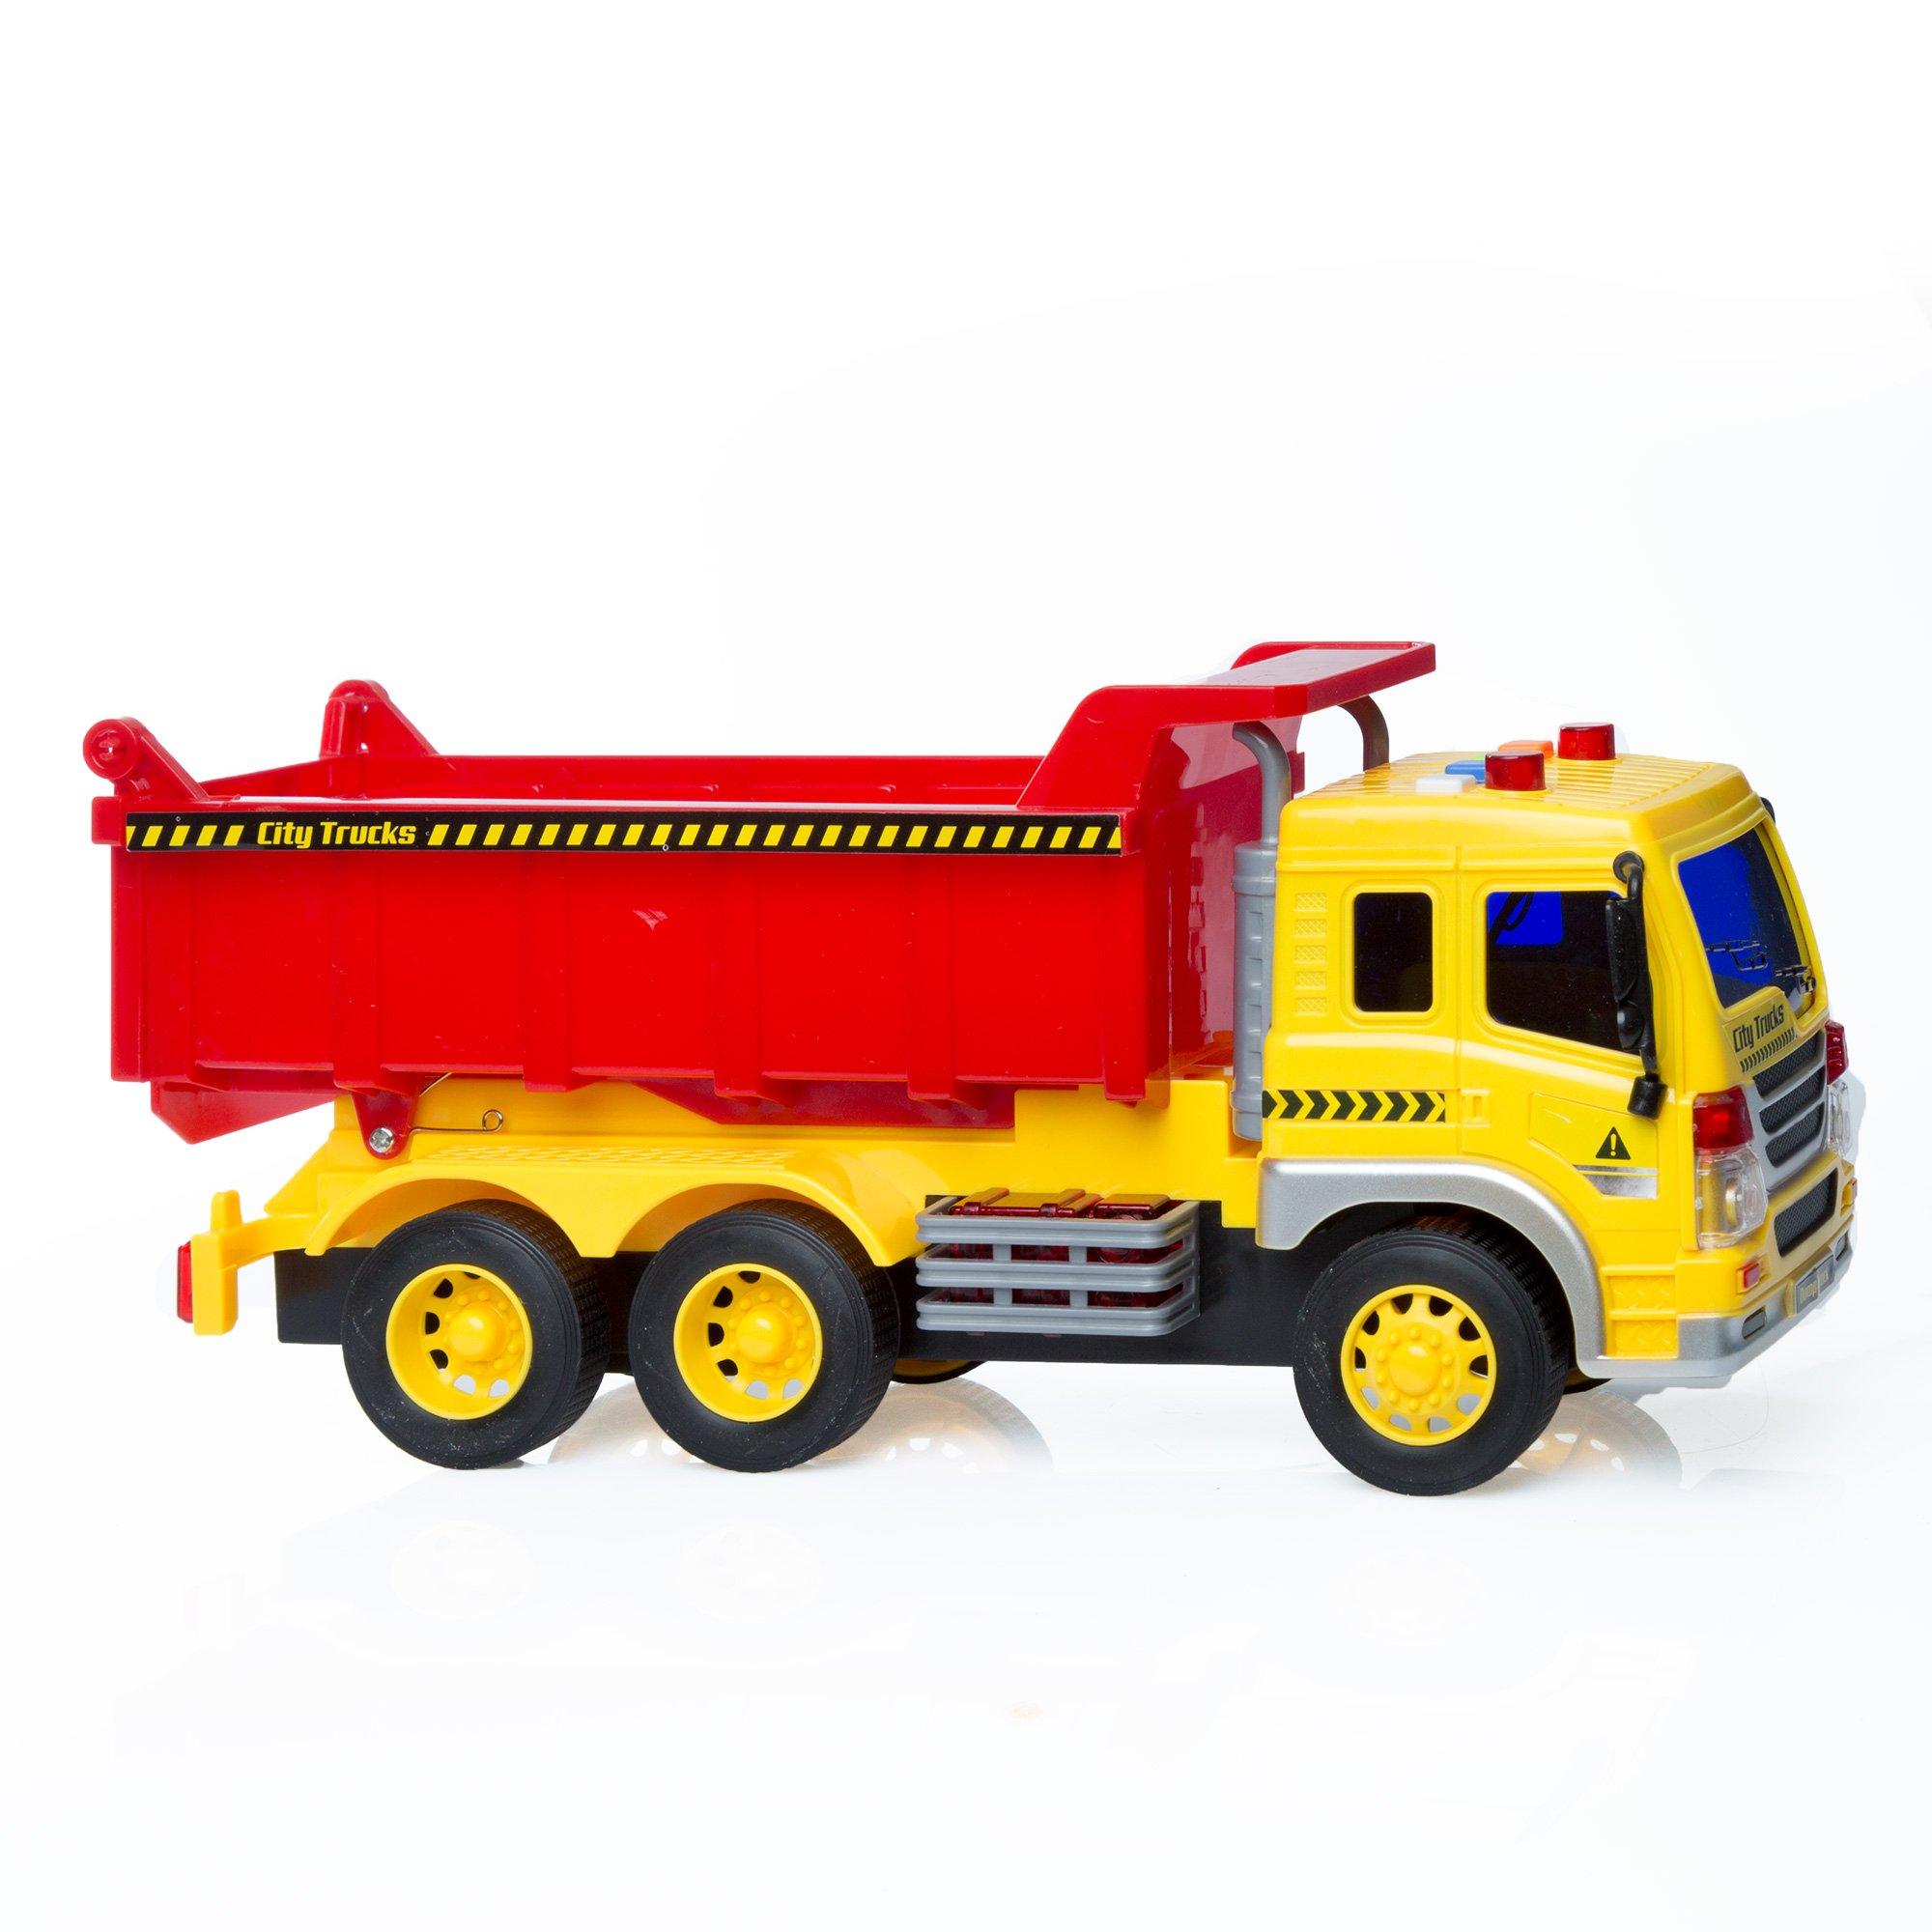 Dump Truck toys for toddler kids 2 3 4 year old boy Car ...